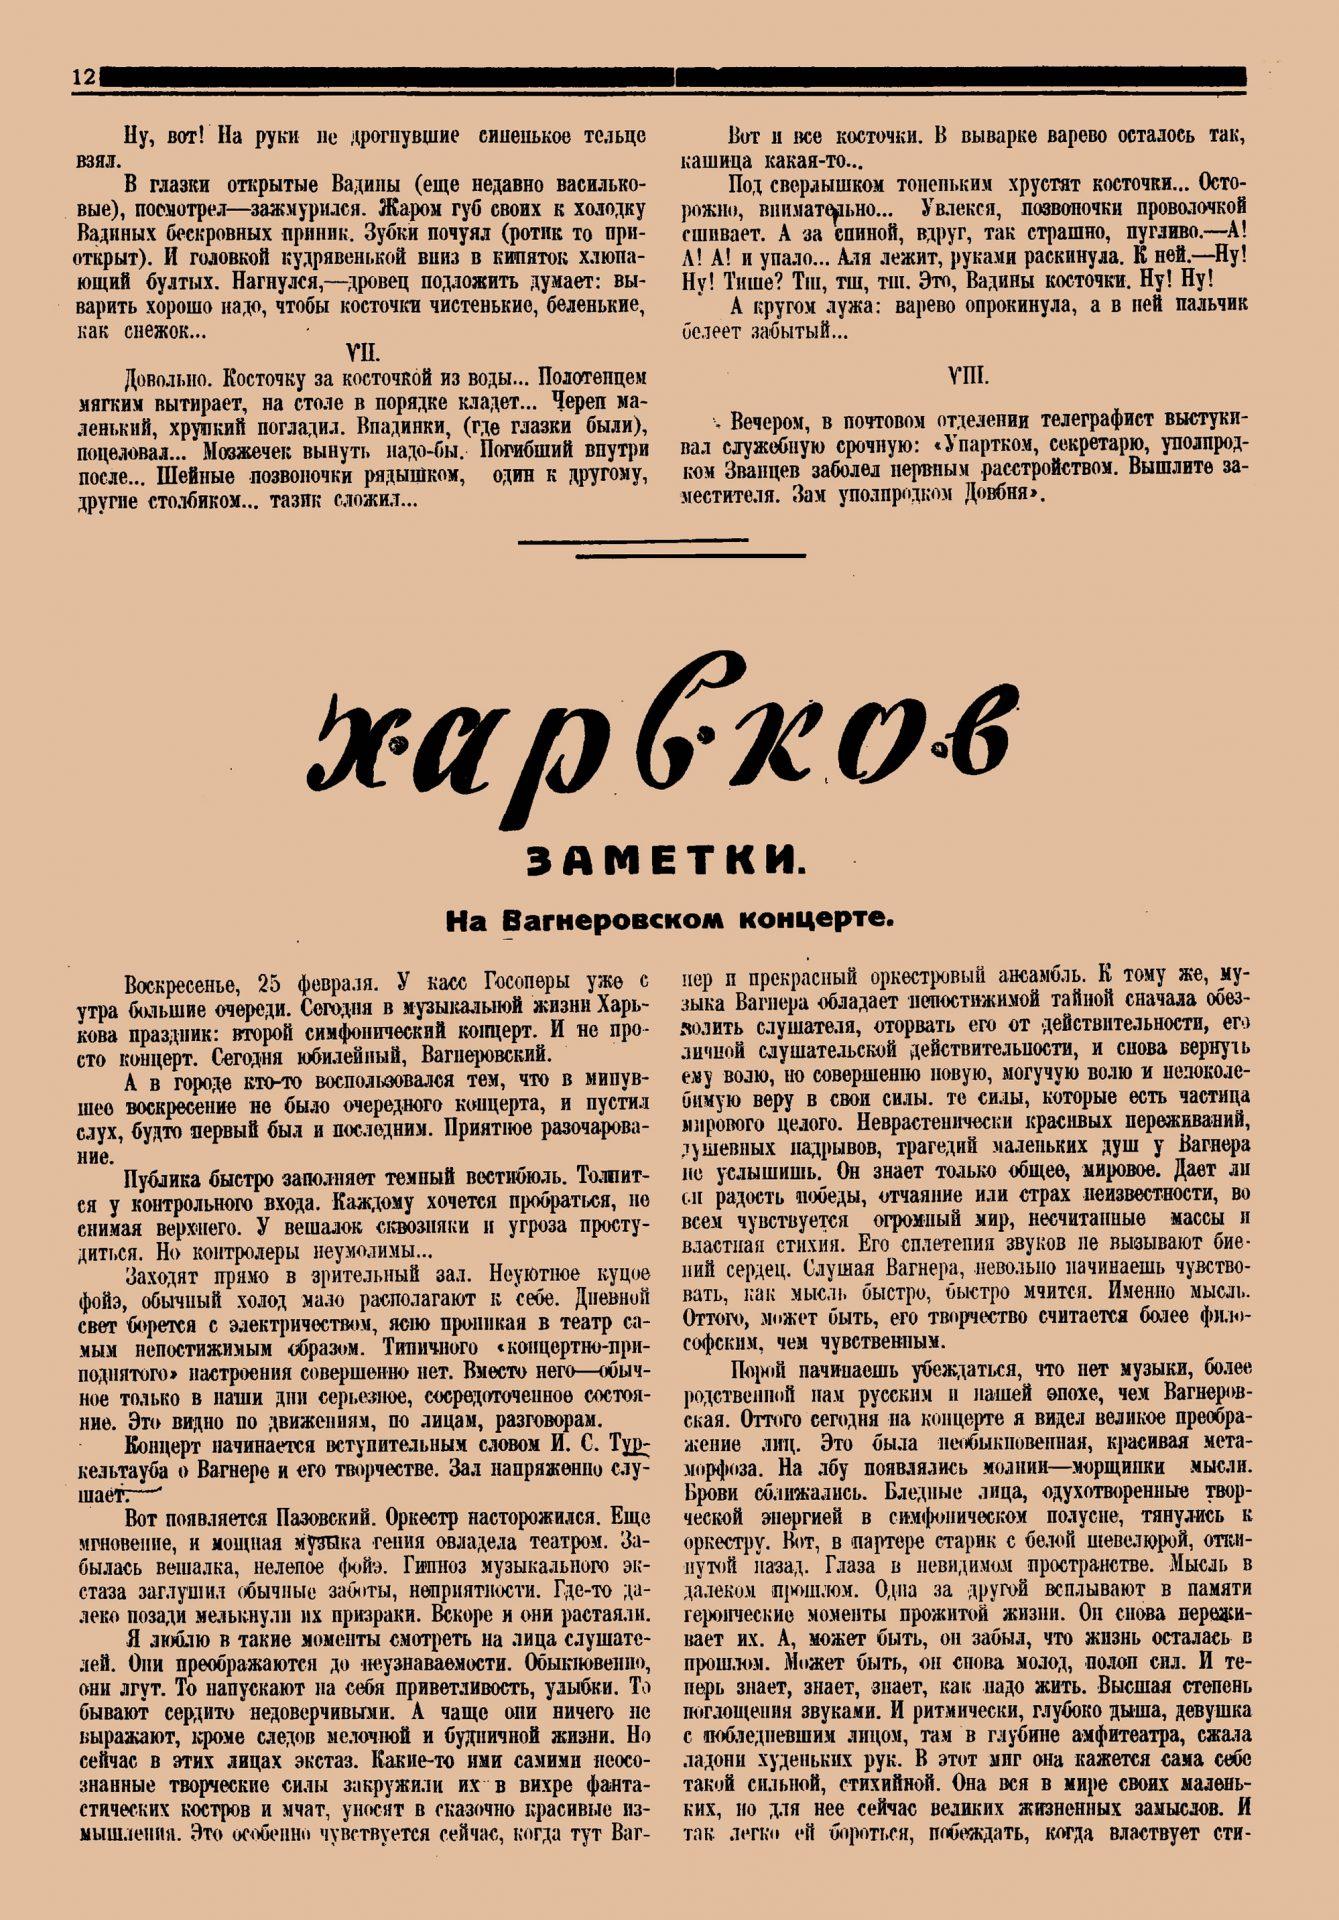 Худож.жизнь_1923_№6